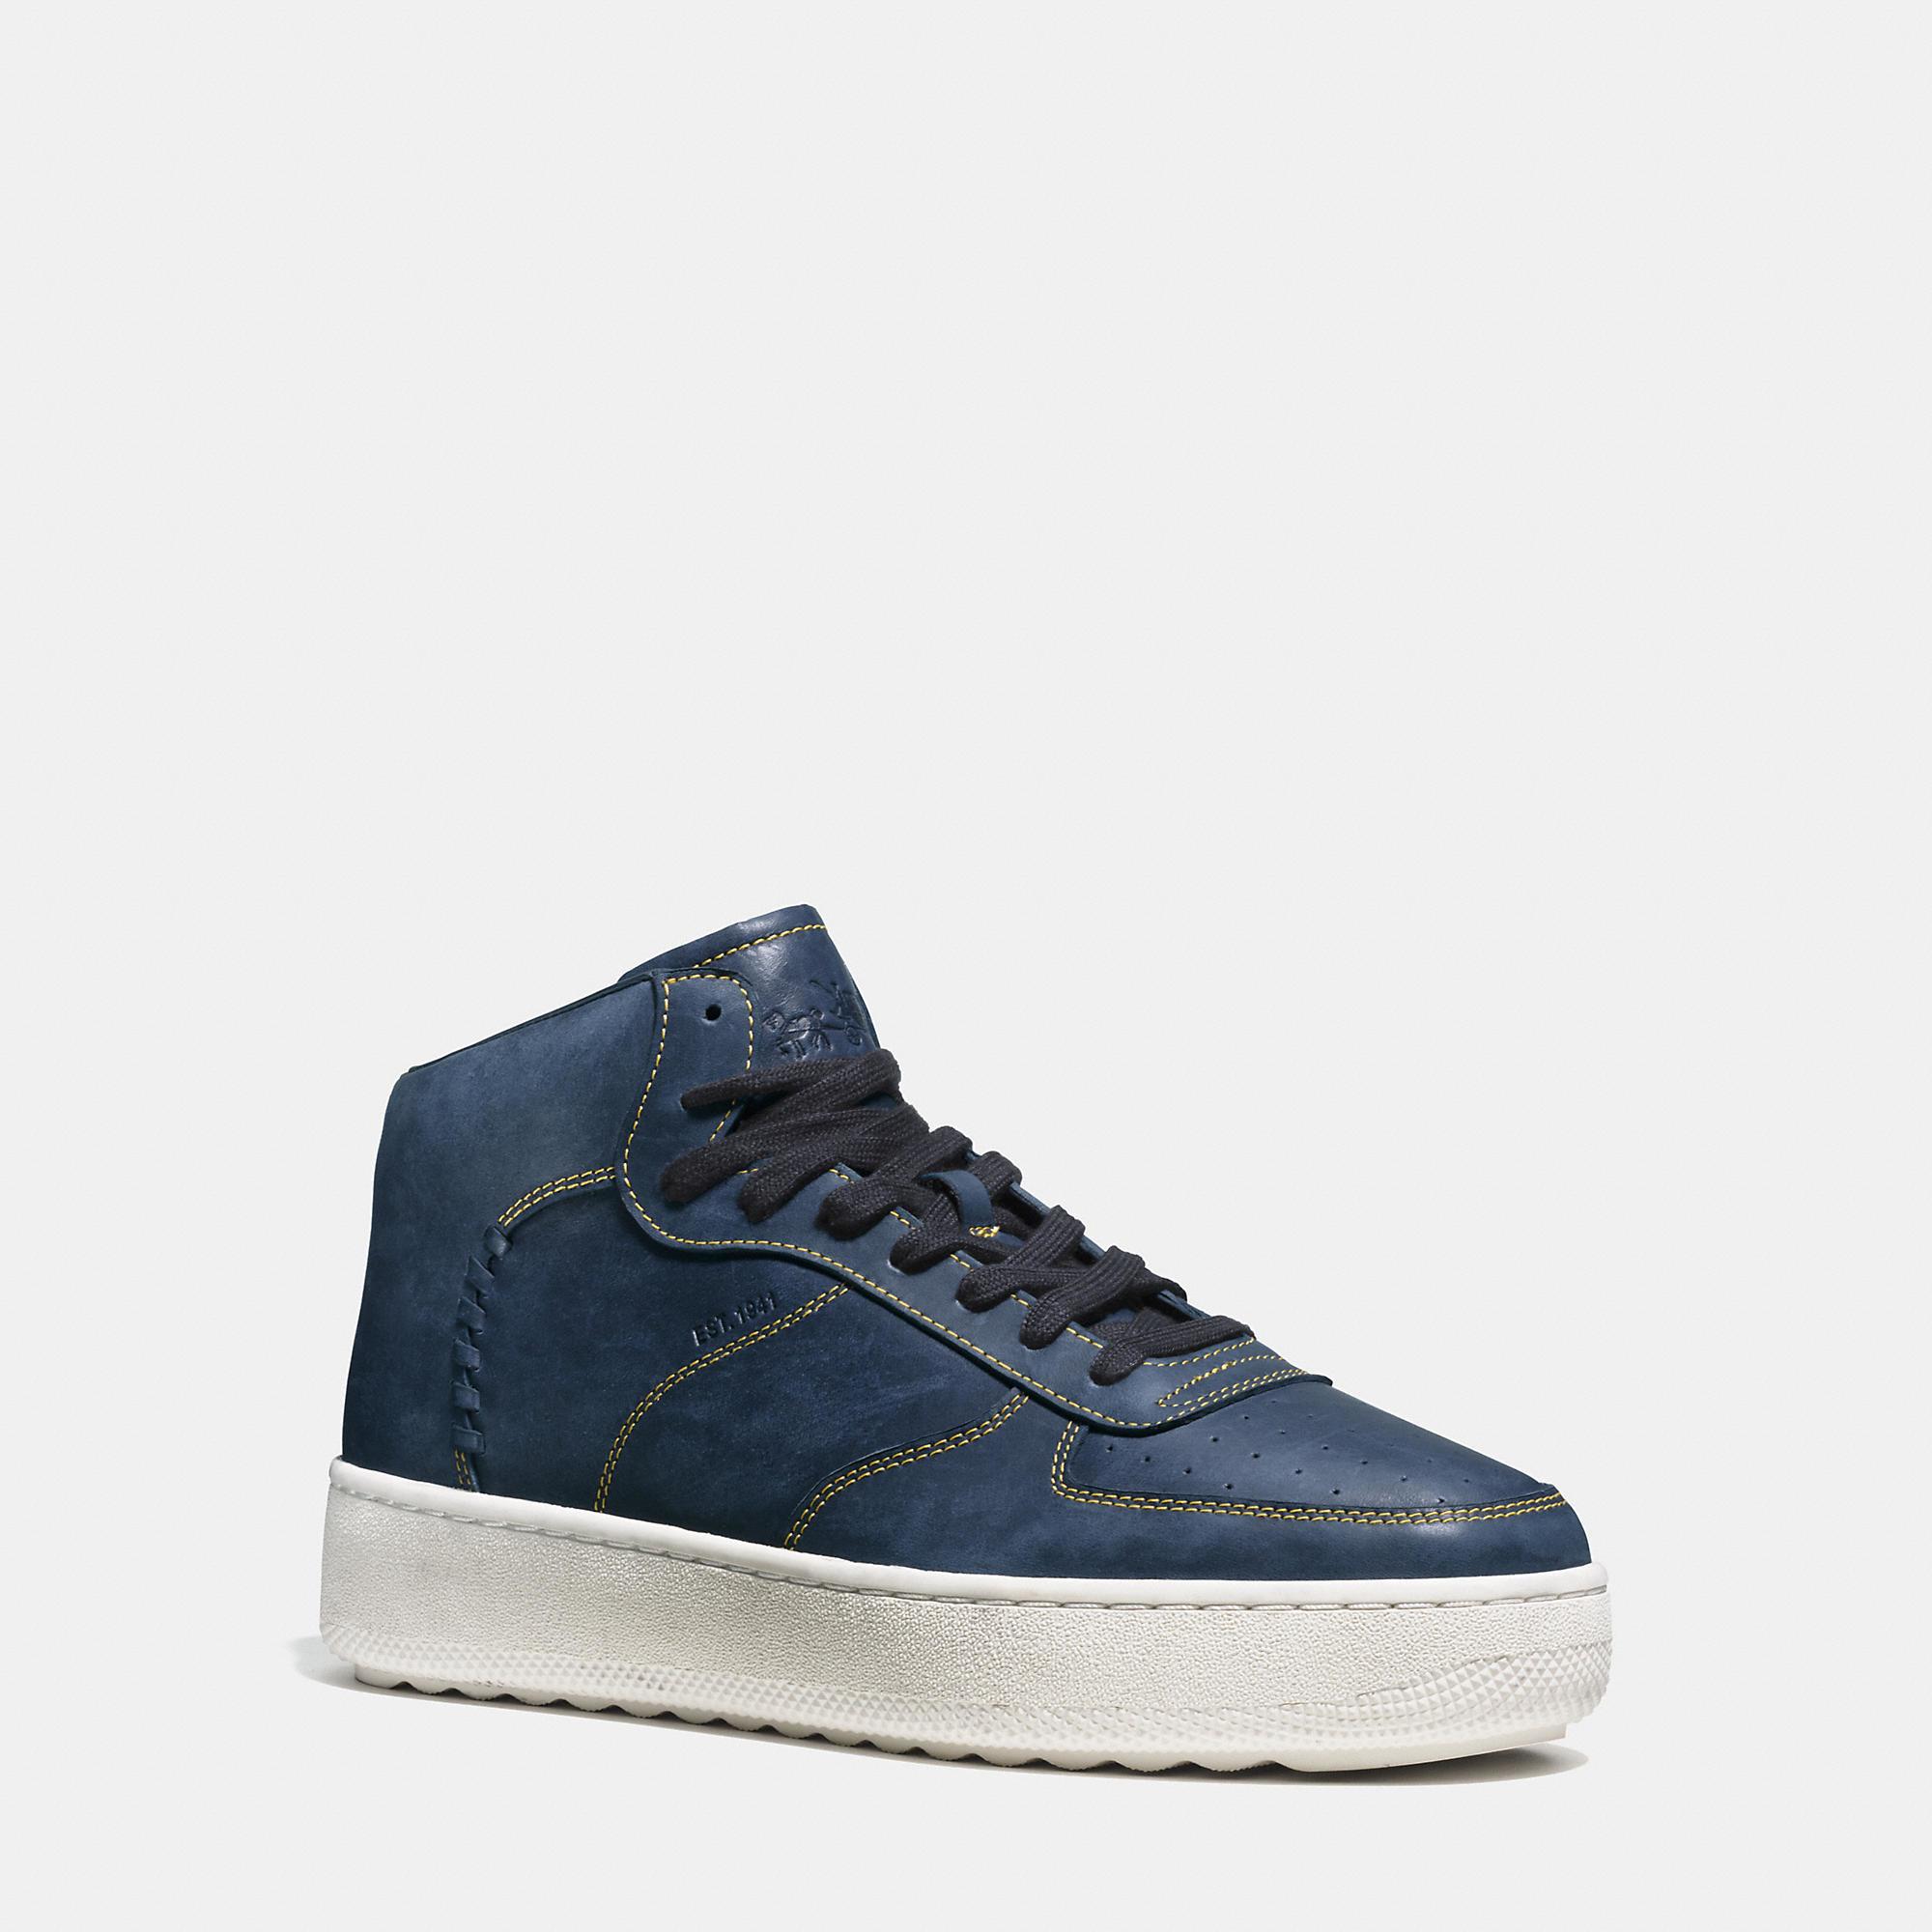 Kenneth Cole Shoes Men Images